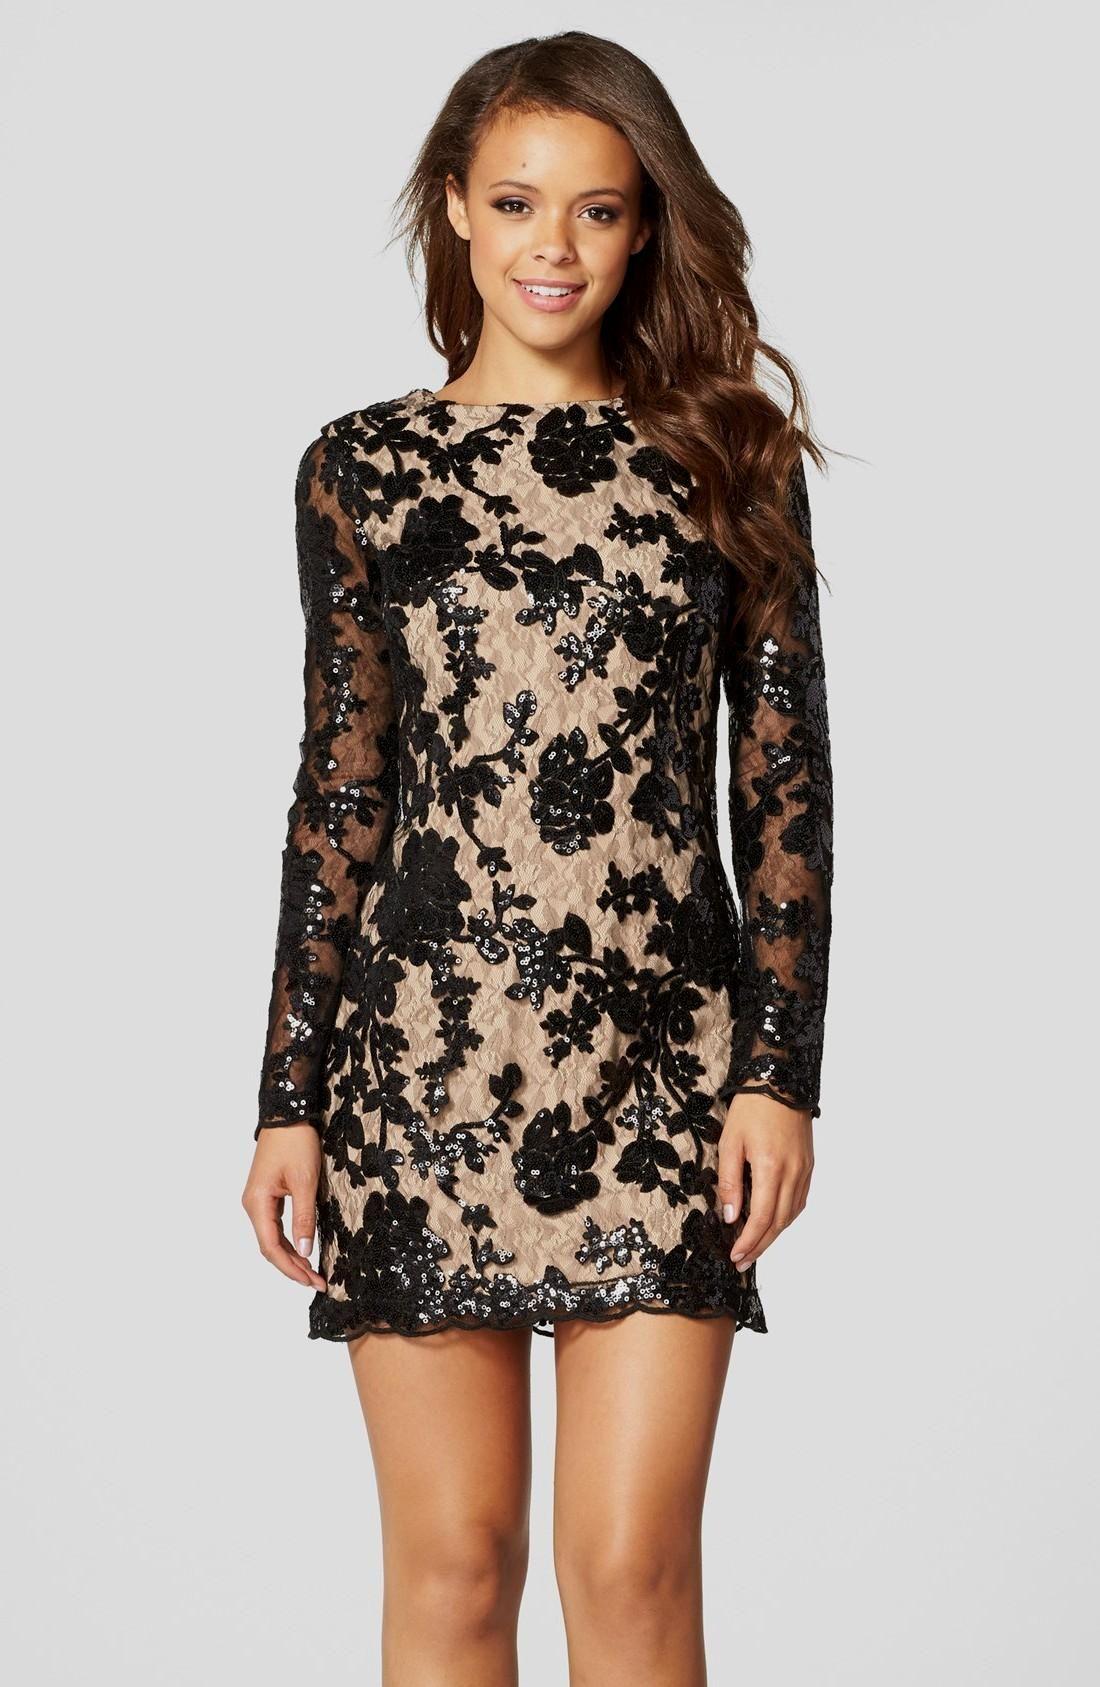 Lace overlay long sheath dress